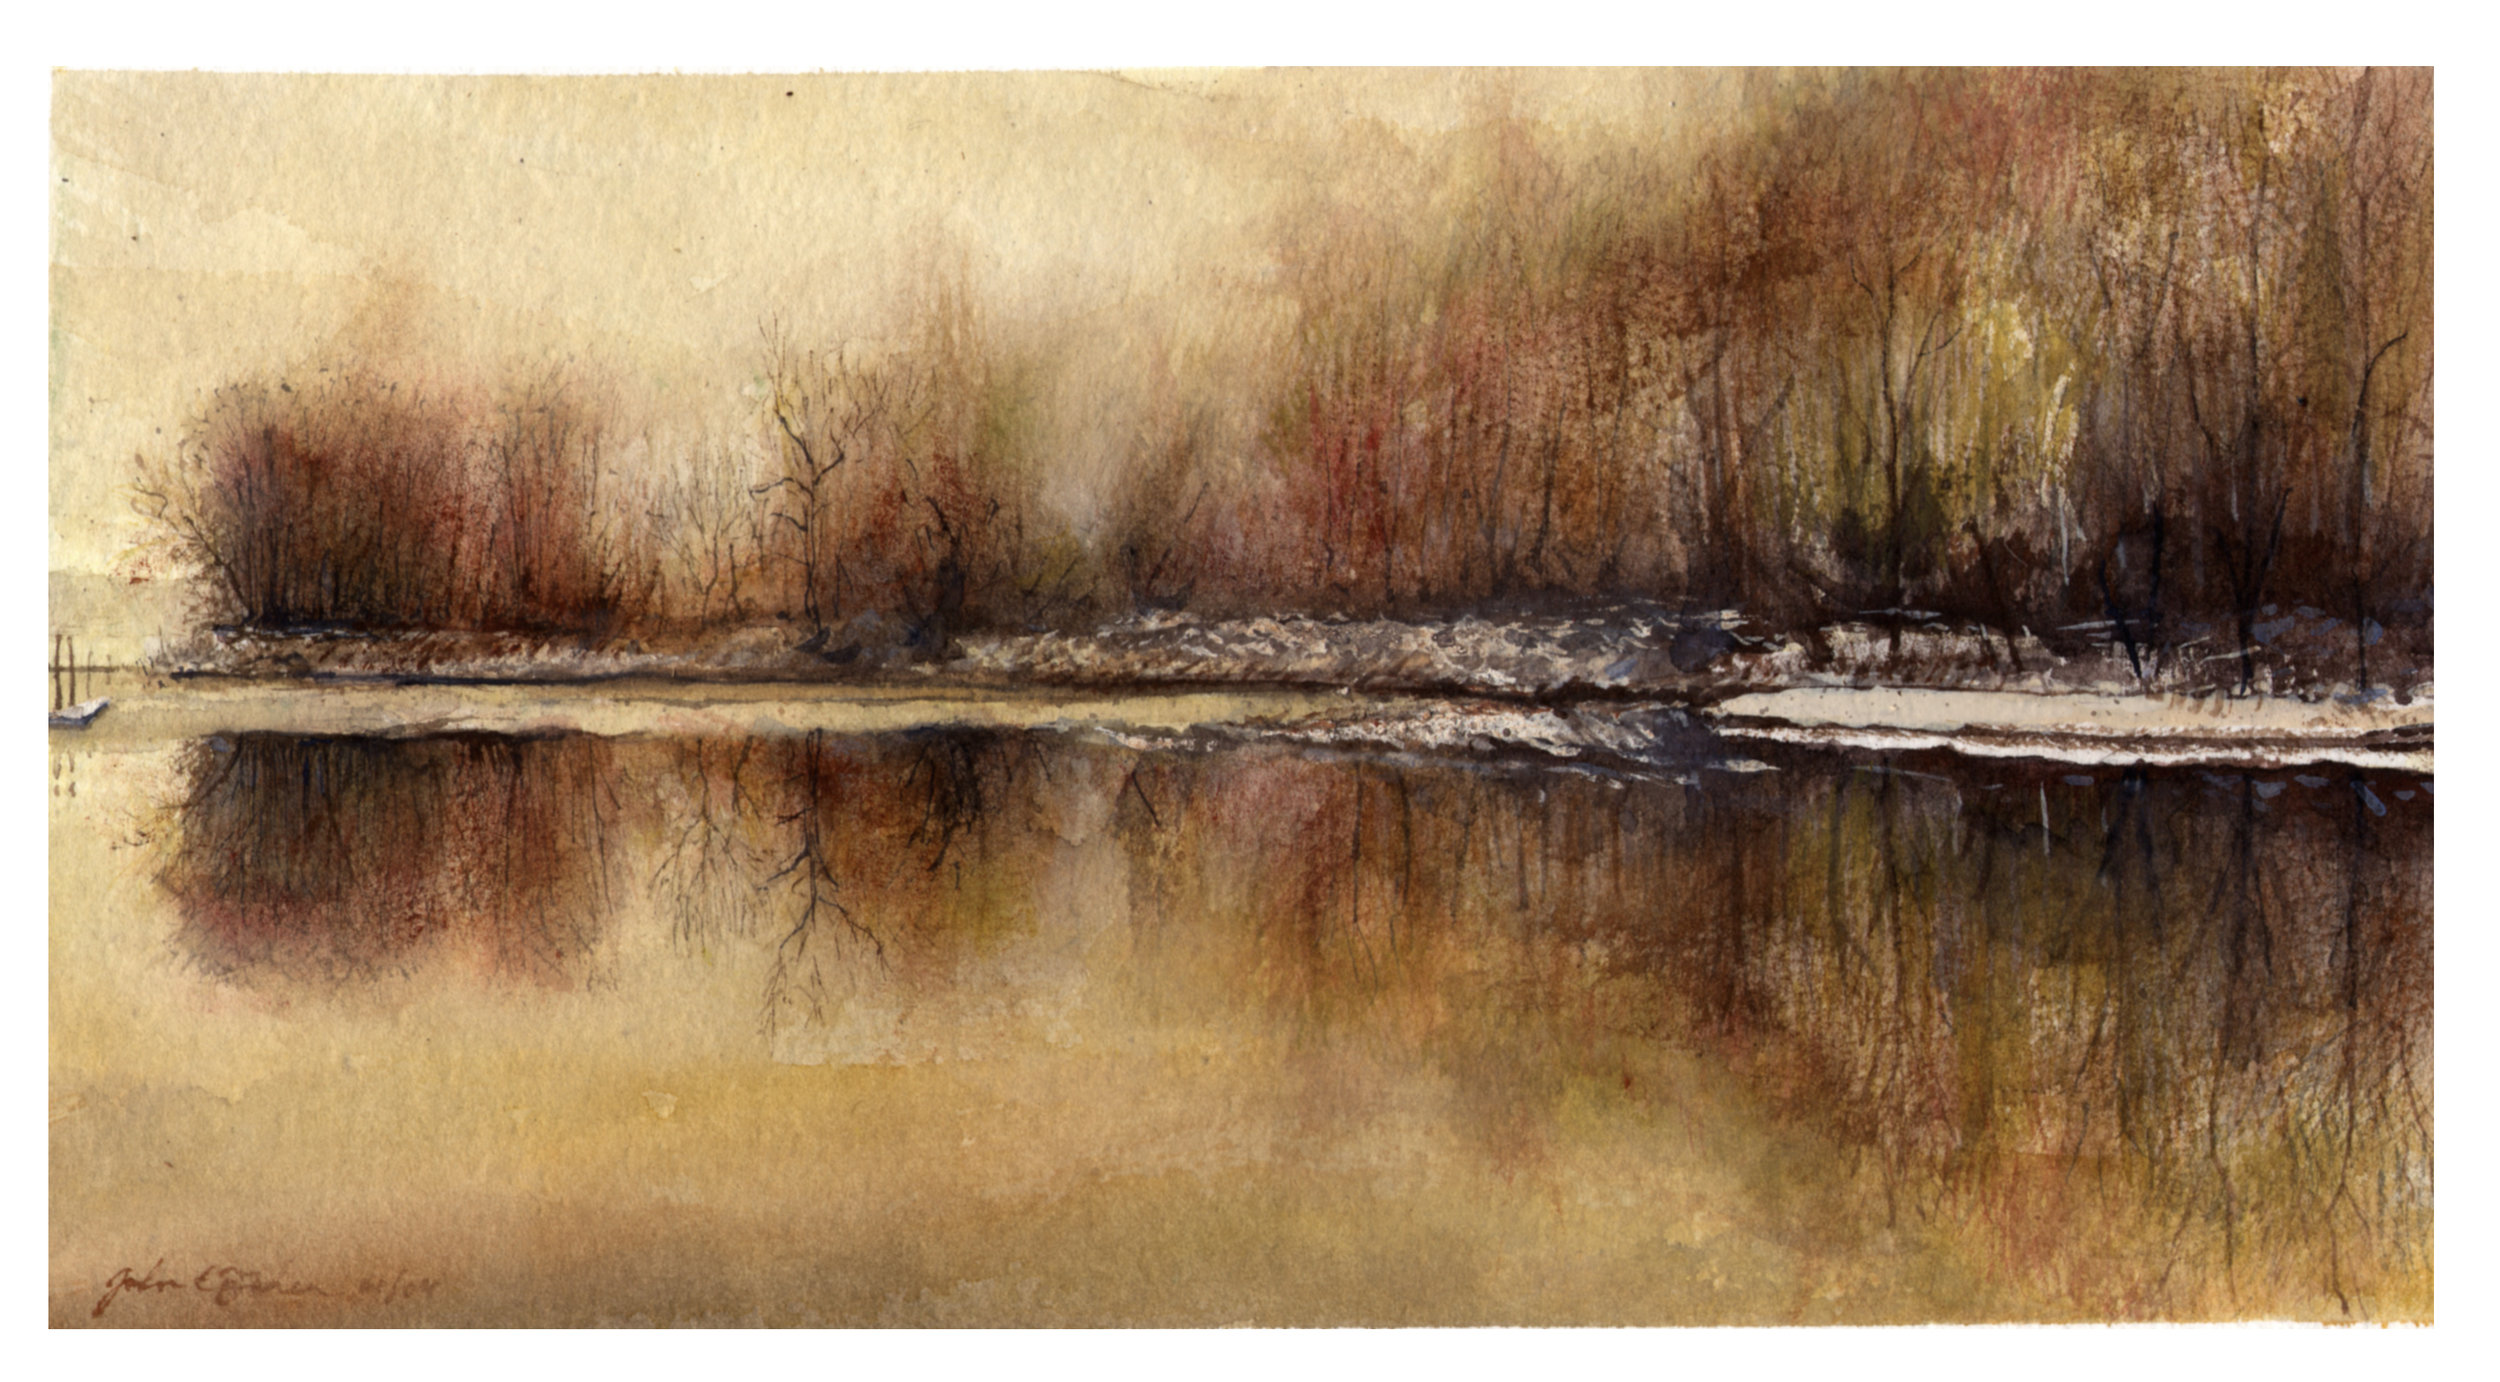 reflection 1(WC_sketch).jpg